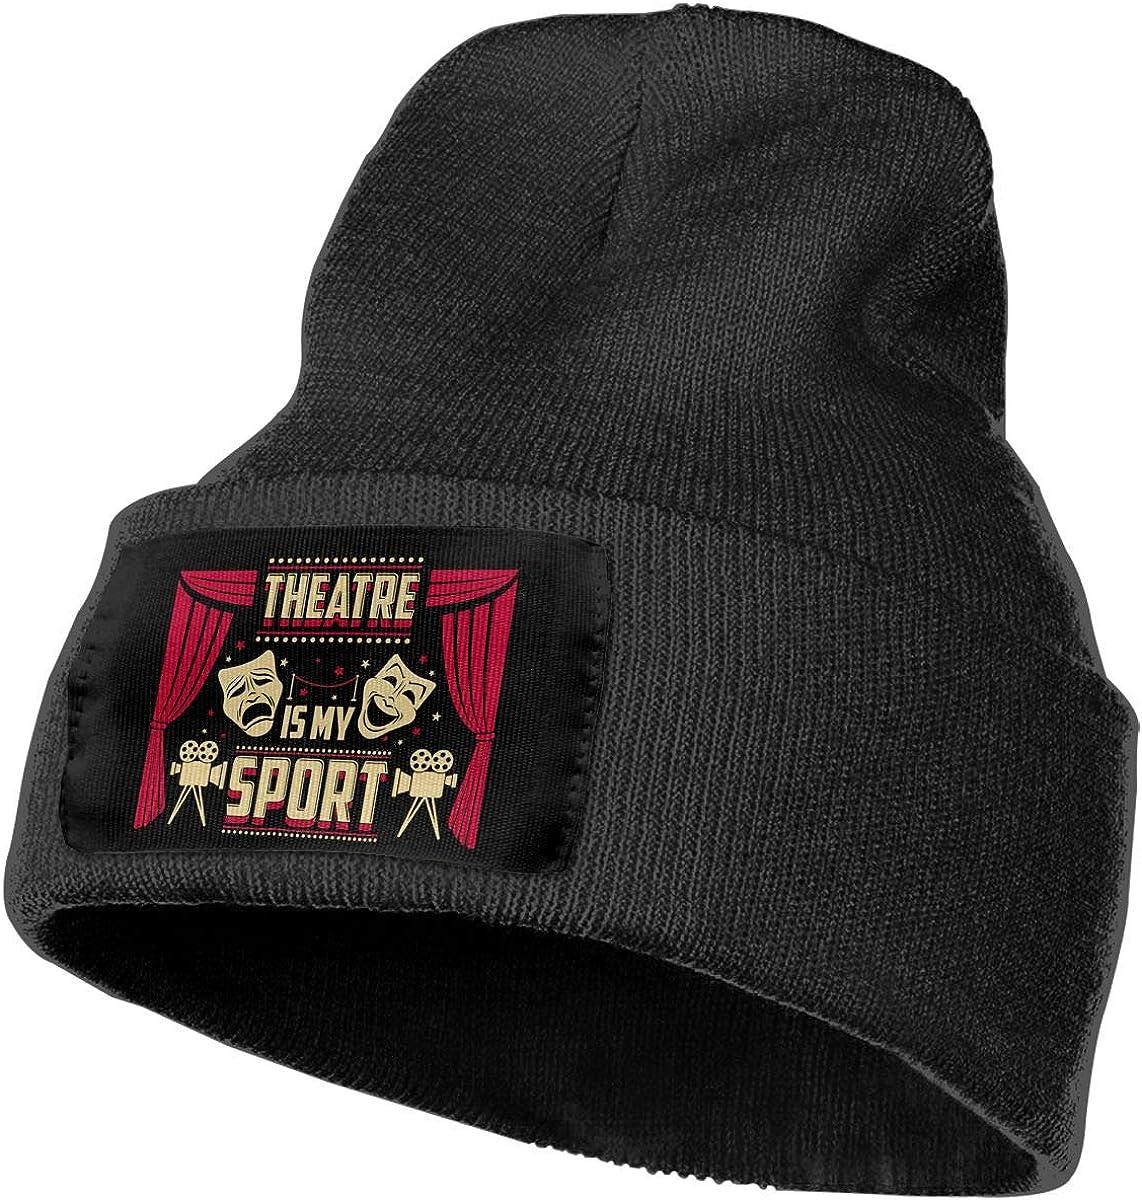 Feeke Mens/&Womens Theatre is My Sport Beanie Cap Thick,Soft,Warm Slouchy Knit Hat Winter Soft Ski Cap